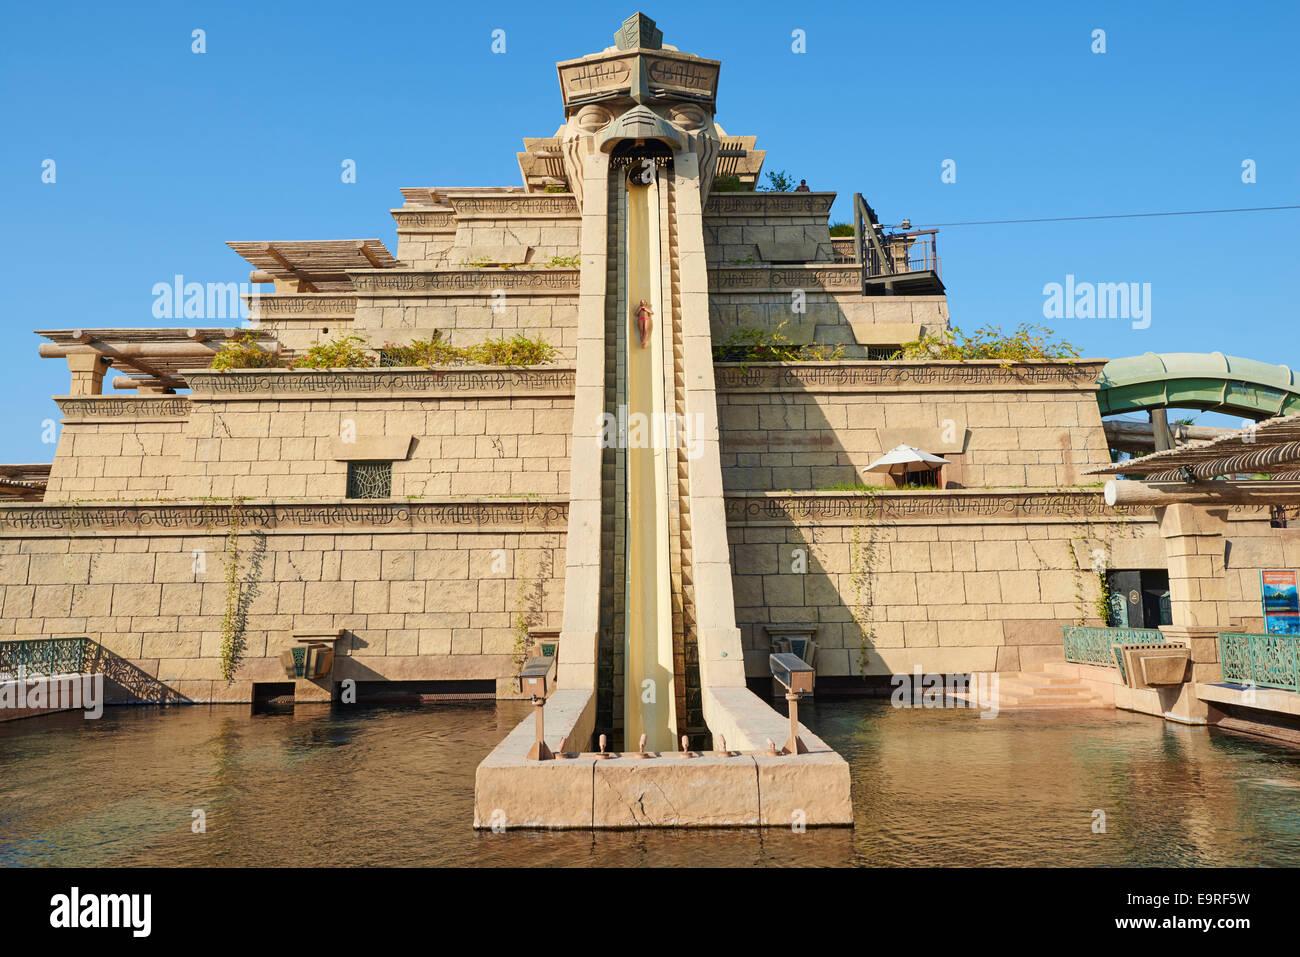 The Tower Of Neptune Water Slide At Aquaventure Waterpark Atlantis Hotel Palm Dubai UAE